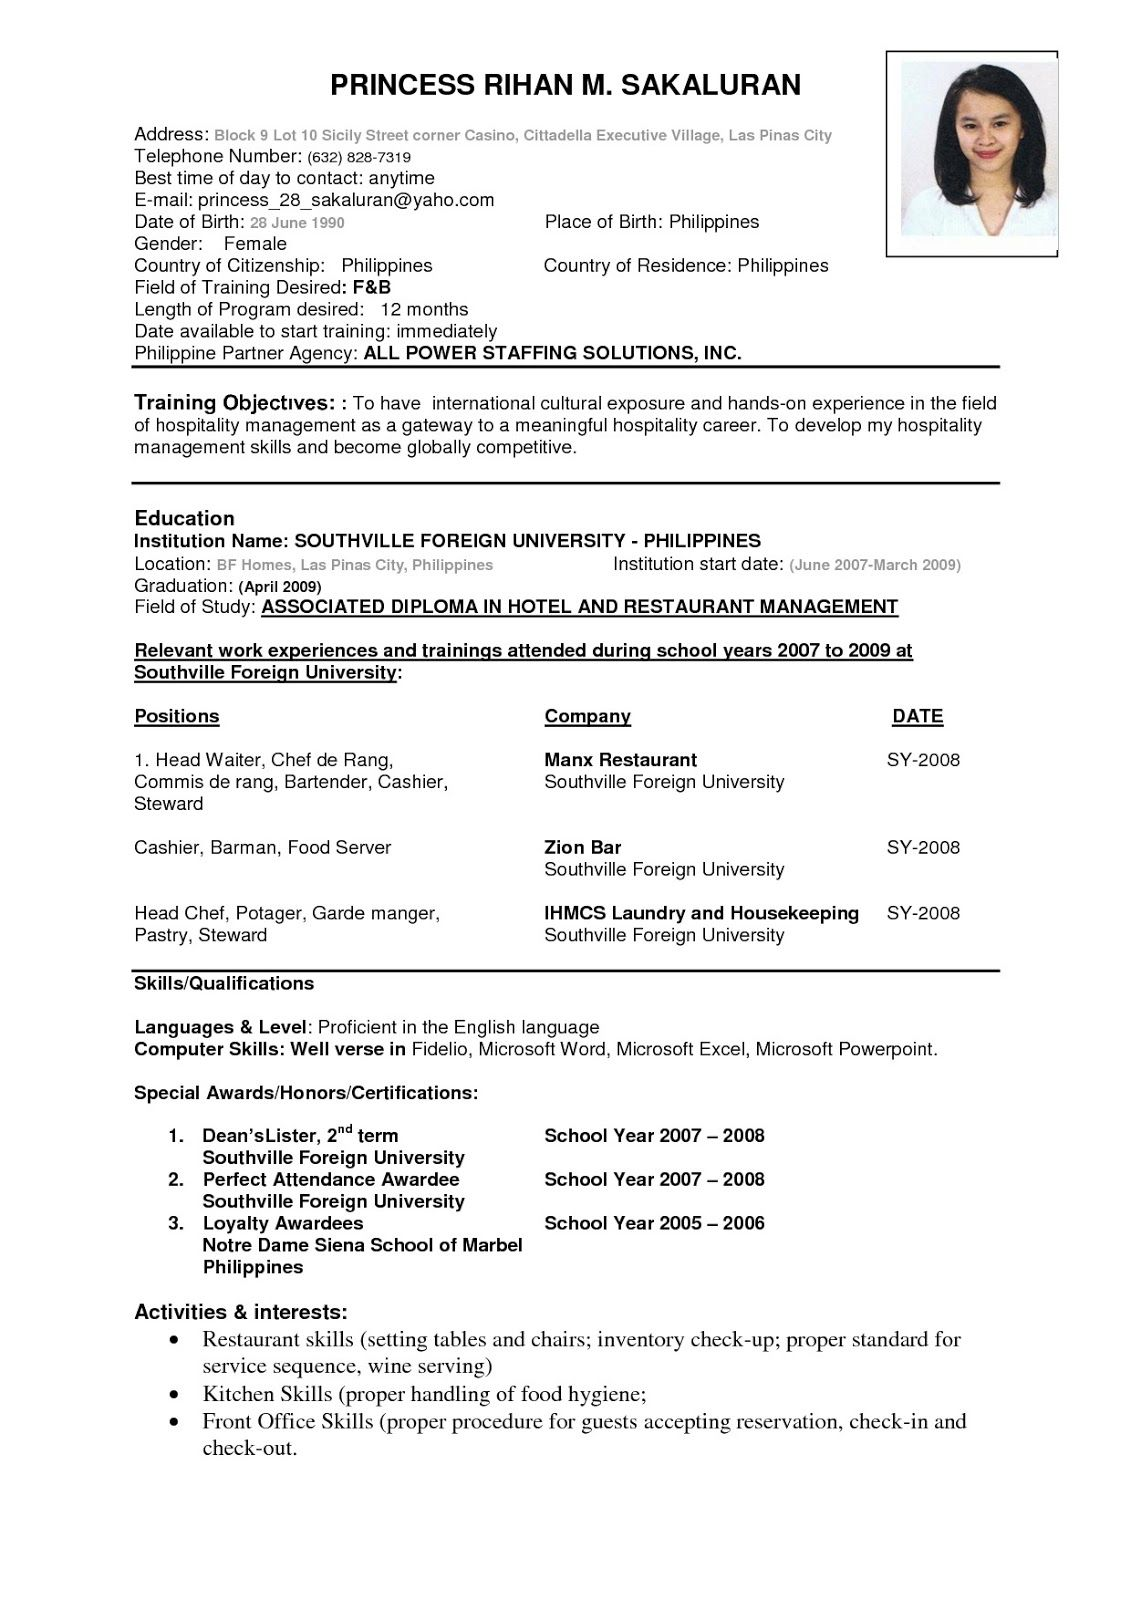 Resume Samples Pdf Format Download